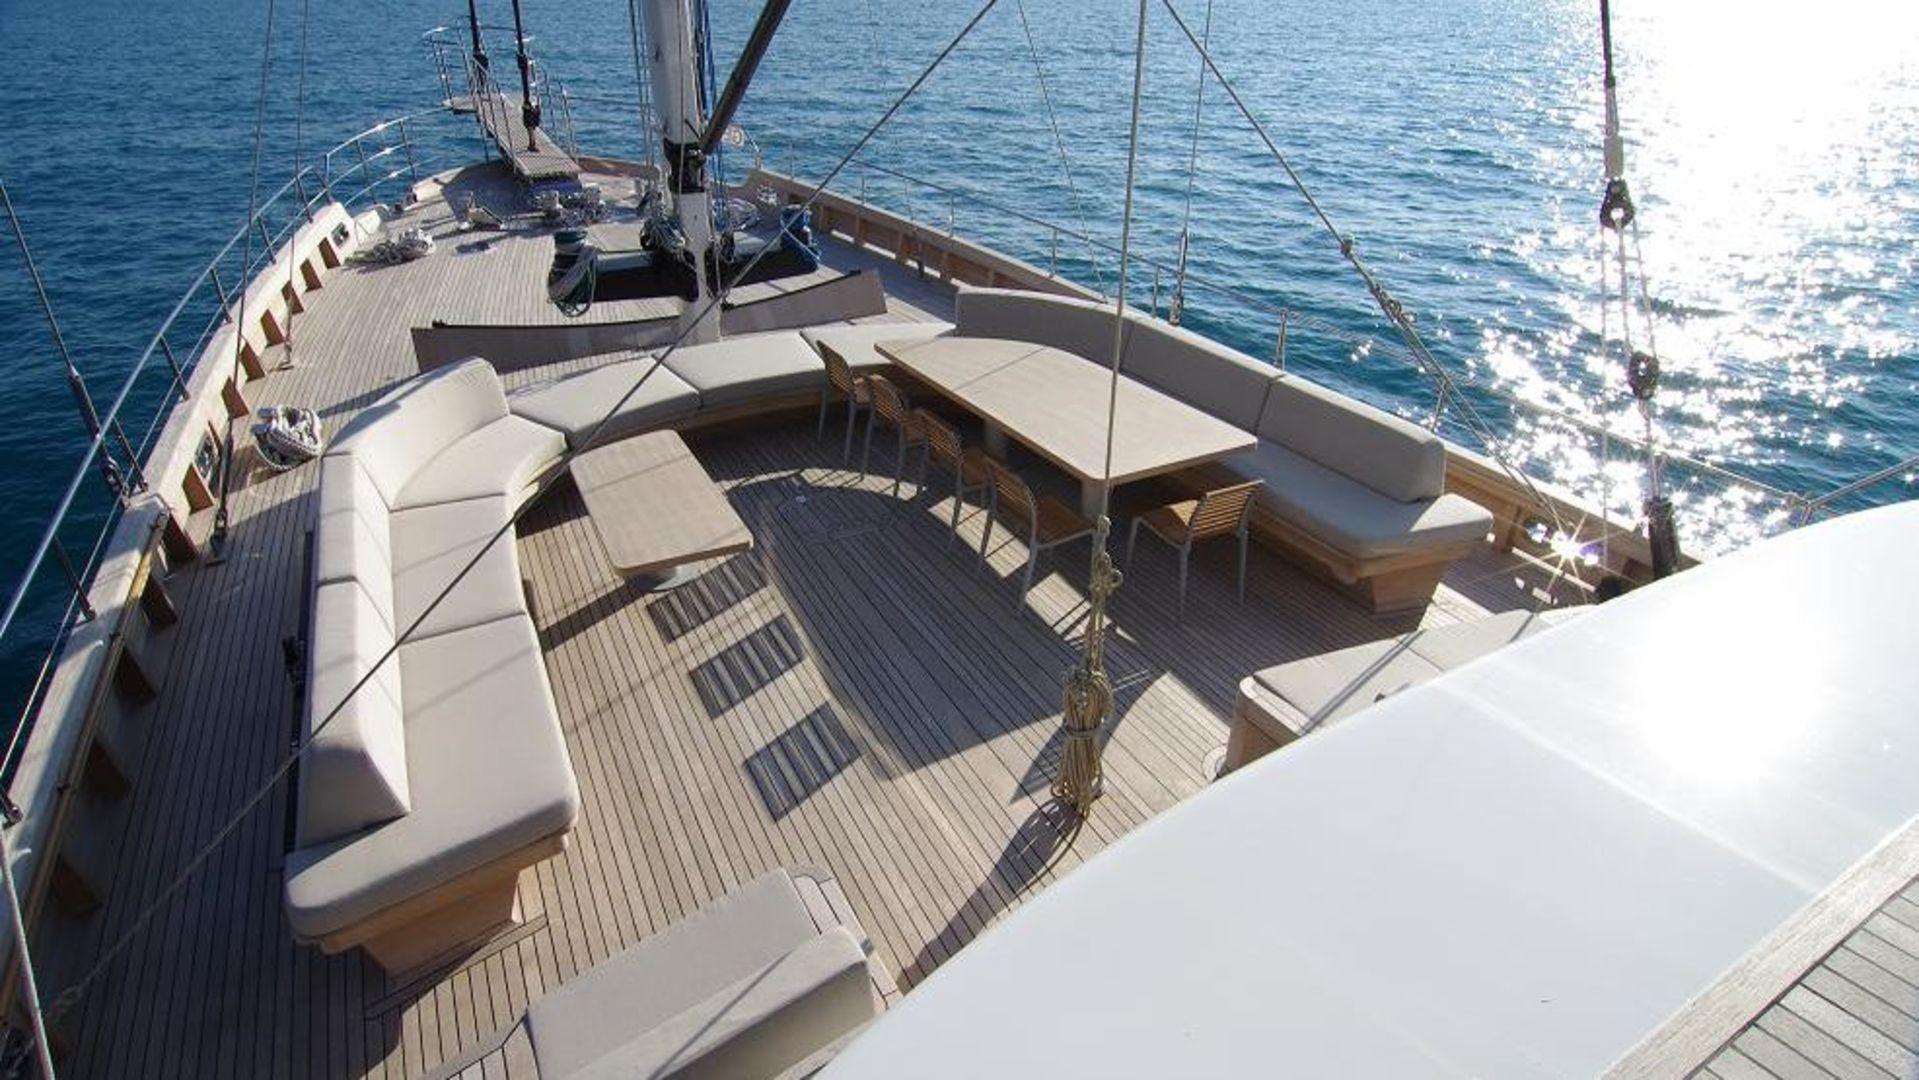 renaissance e andromeda yacht pozzetto